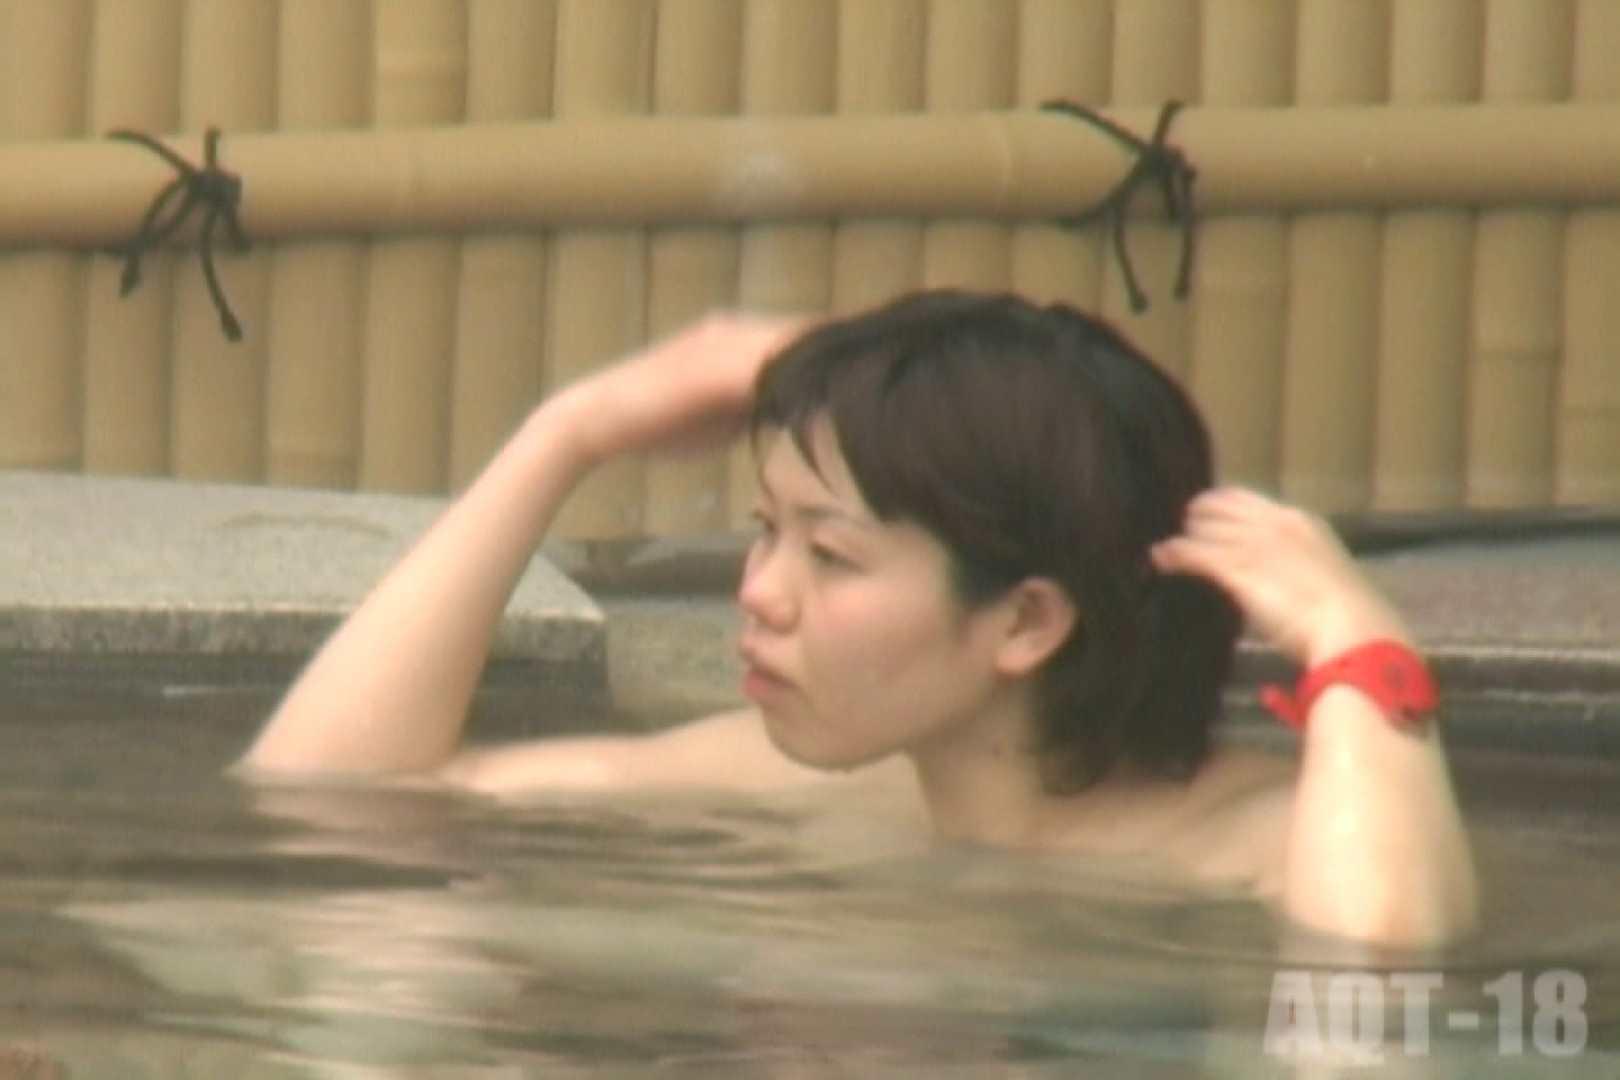 Aquaな露天風呂Vol.861 露天風呂 オメコ無修正動画無料 107連発 44